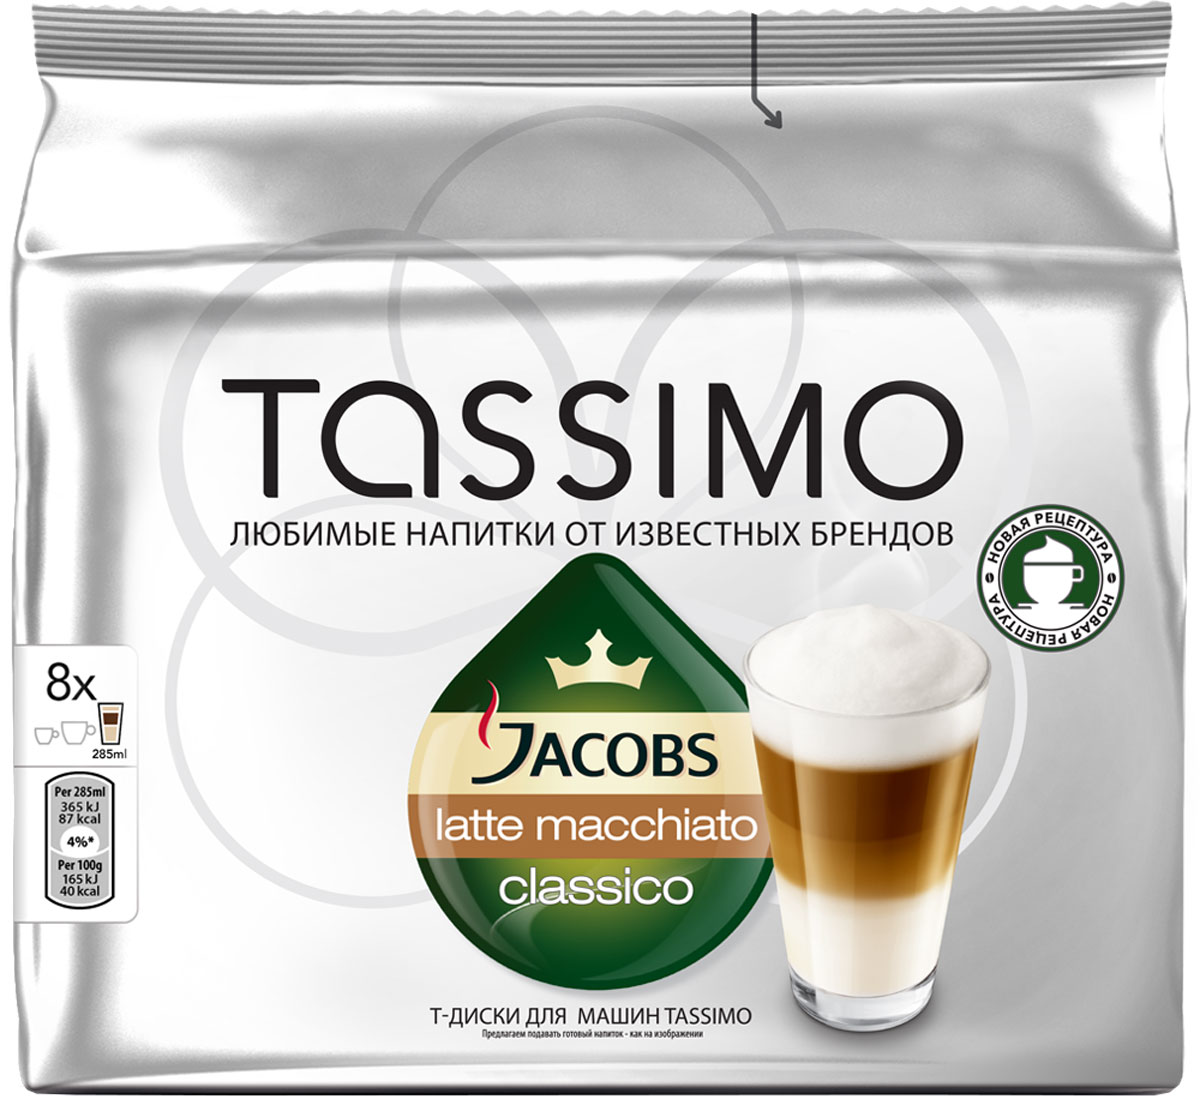 Tassimo Jacobs Latte Macchiato Classico кофе капсульный, 8 шт аксессуар delonghi чашки для латте macchiato